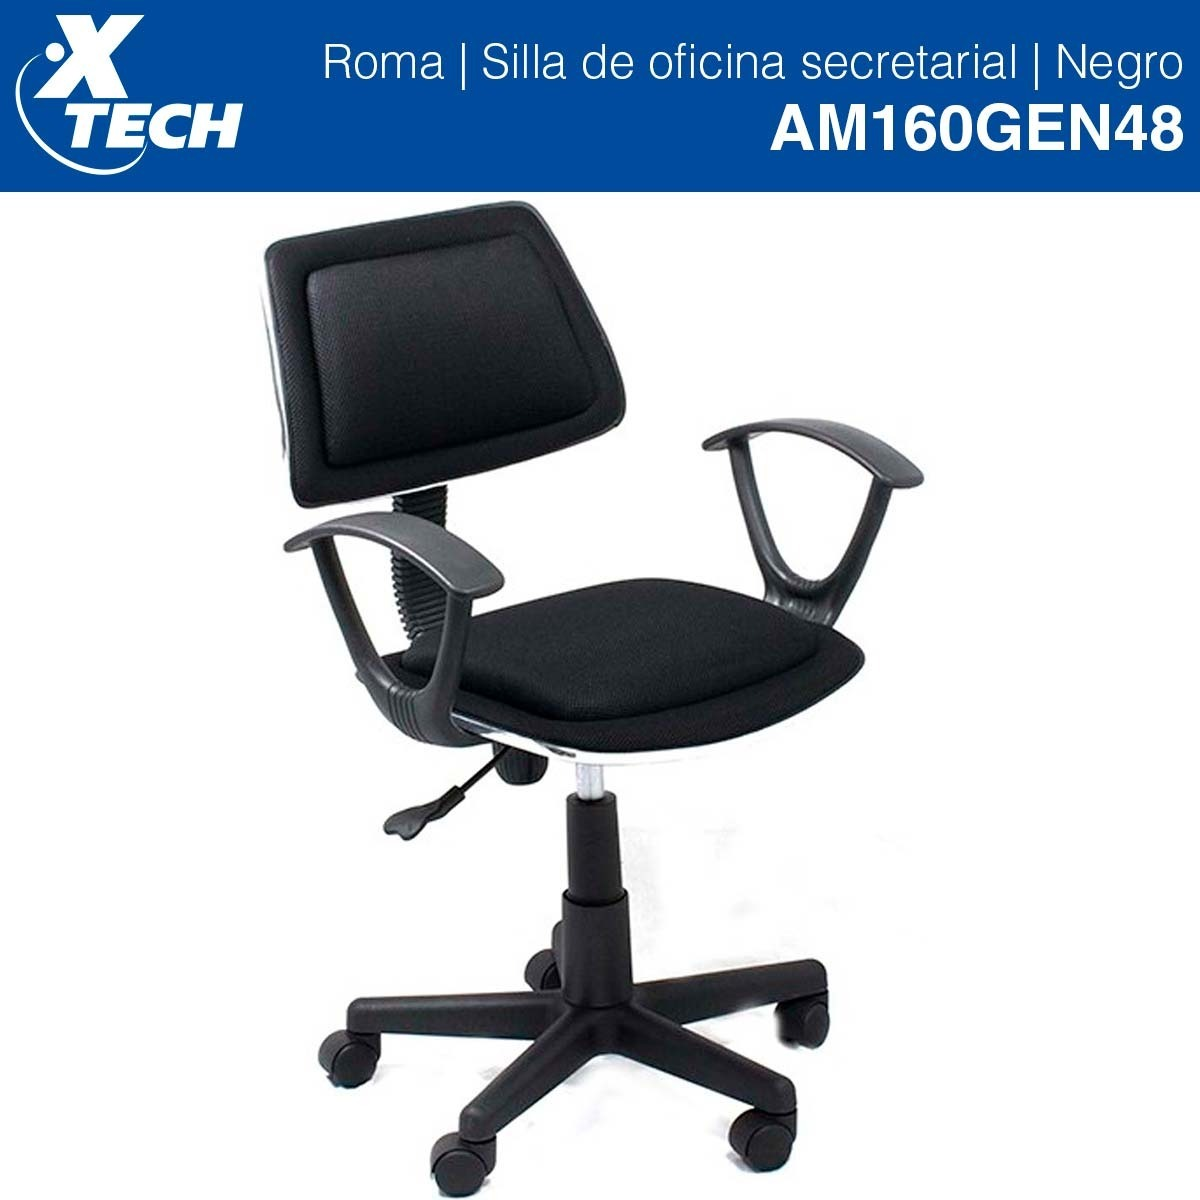 Silla Xtech Descansabrazos Economica Gen48 Pqsuzvmg Oficina Ejecutiva WI9YH2ED